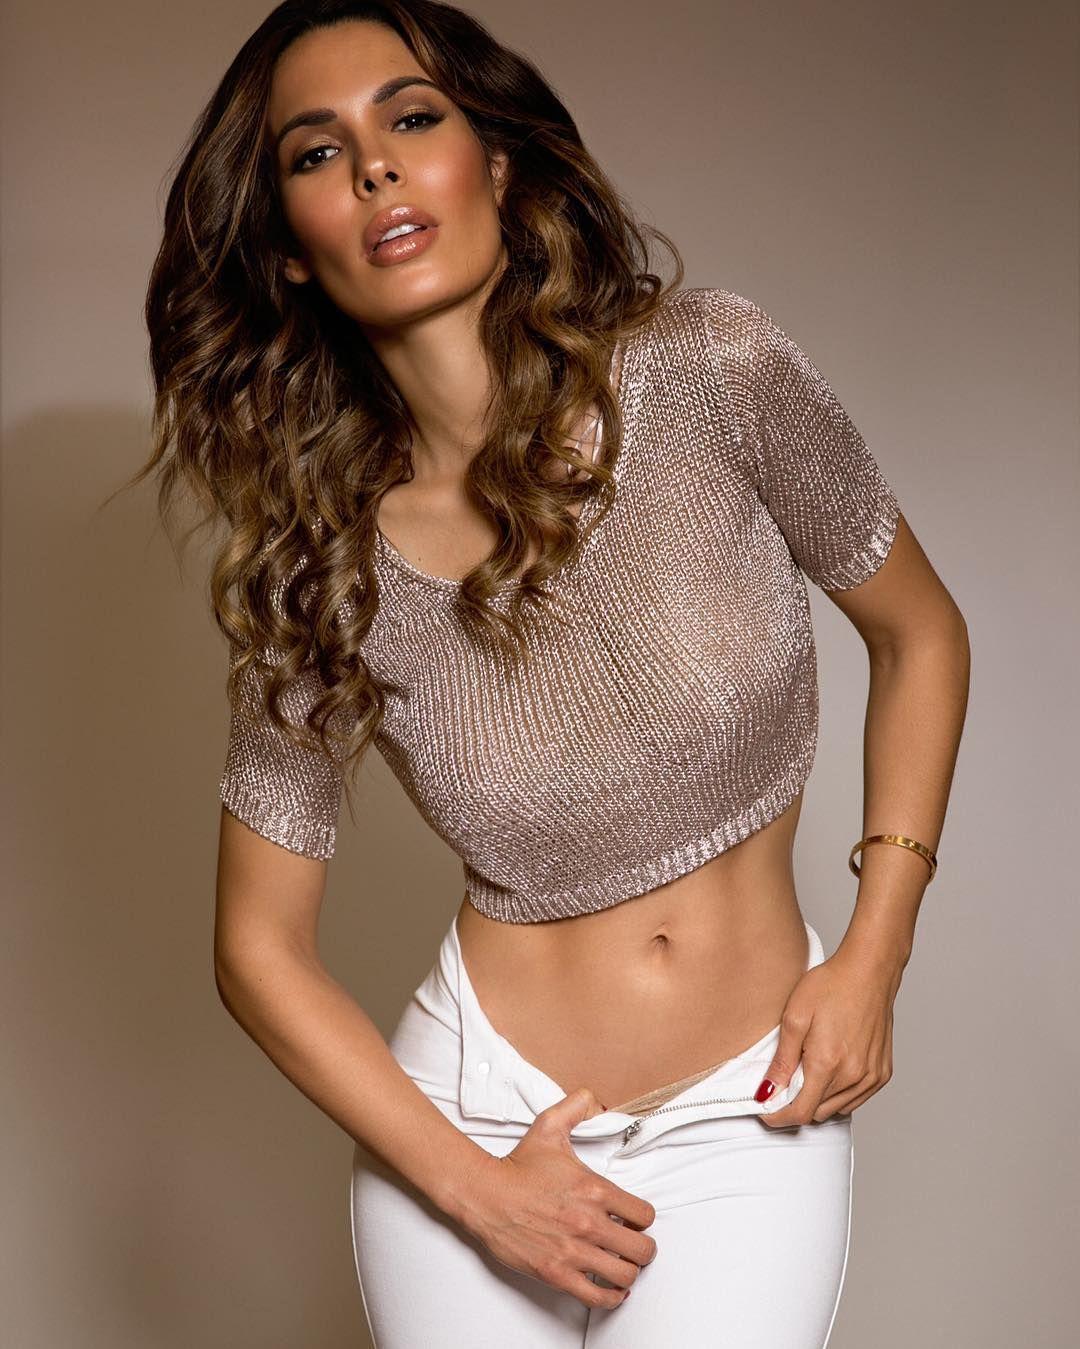 pictures Nadine Velazquez